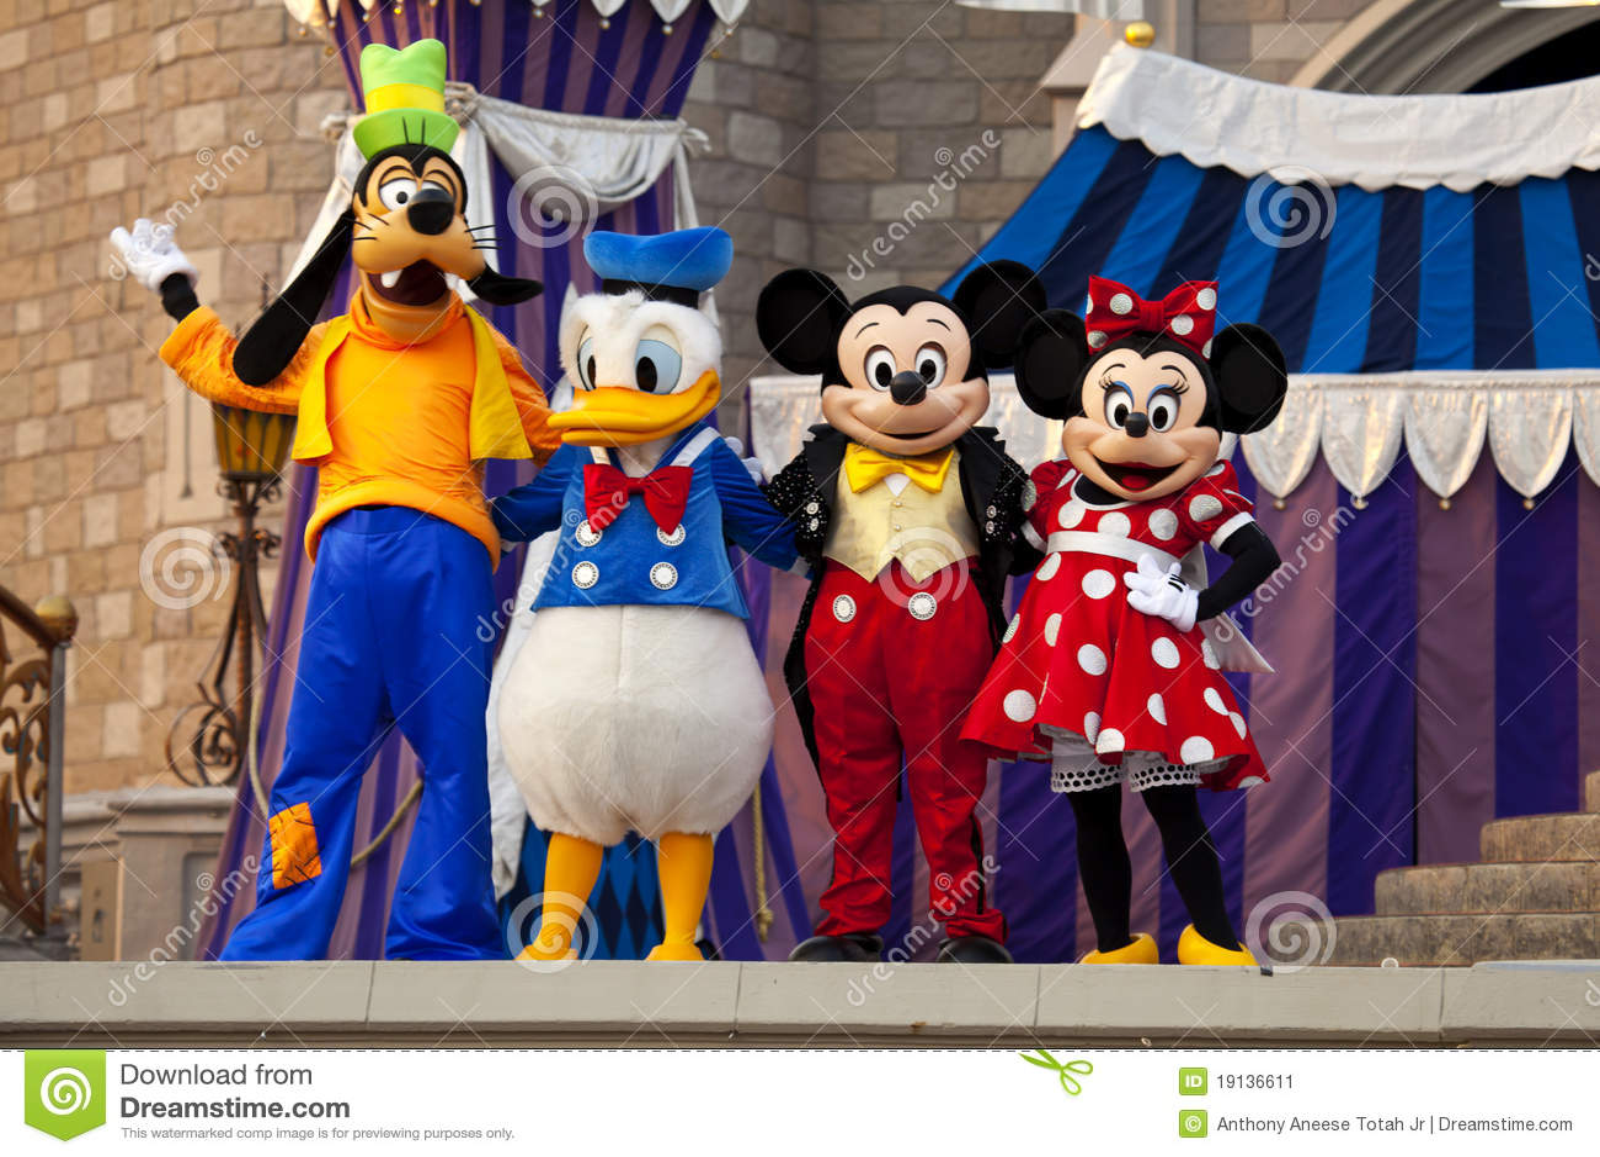 Souris de Mickey et de Minnie, canard de Donald et Goofy